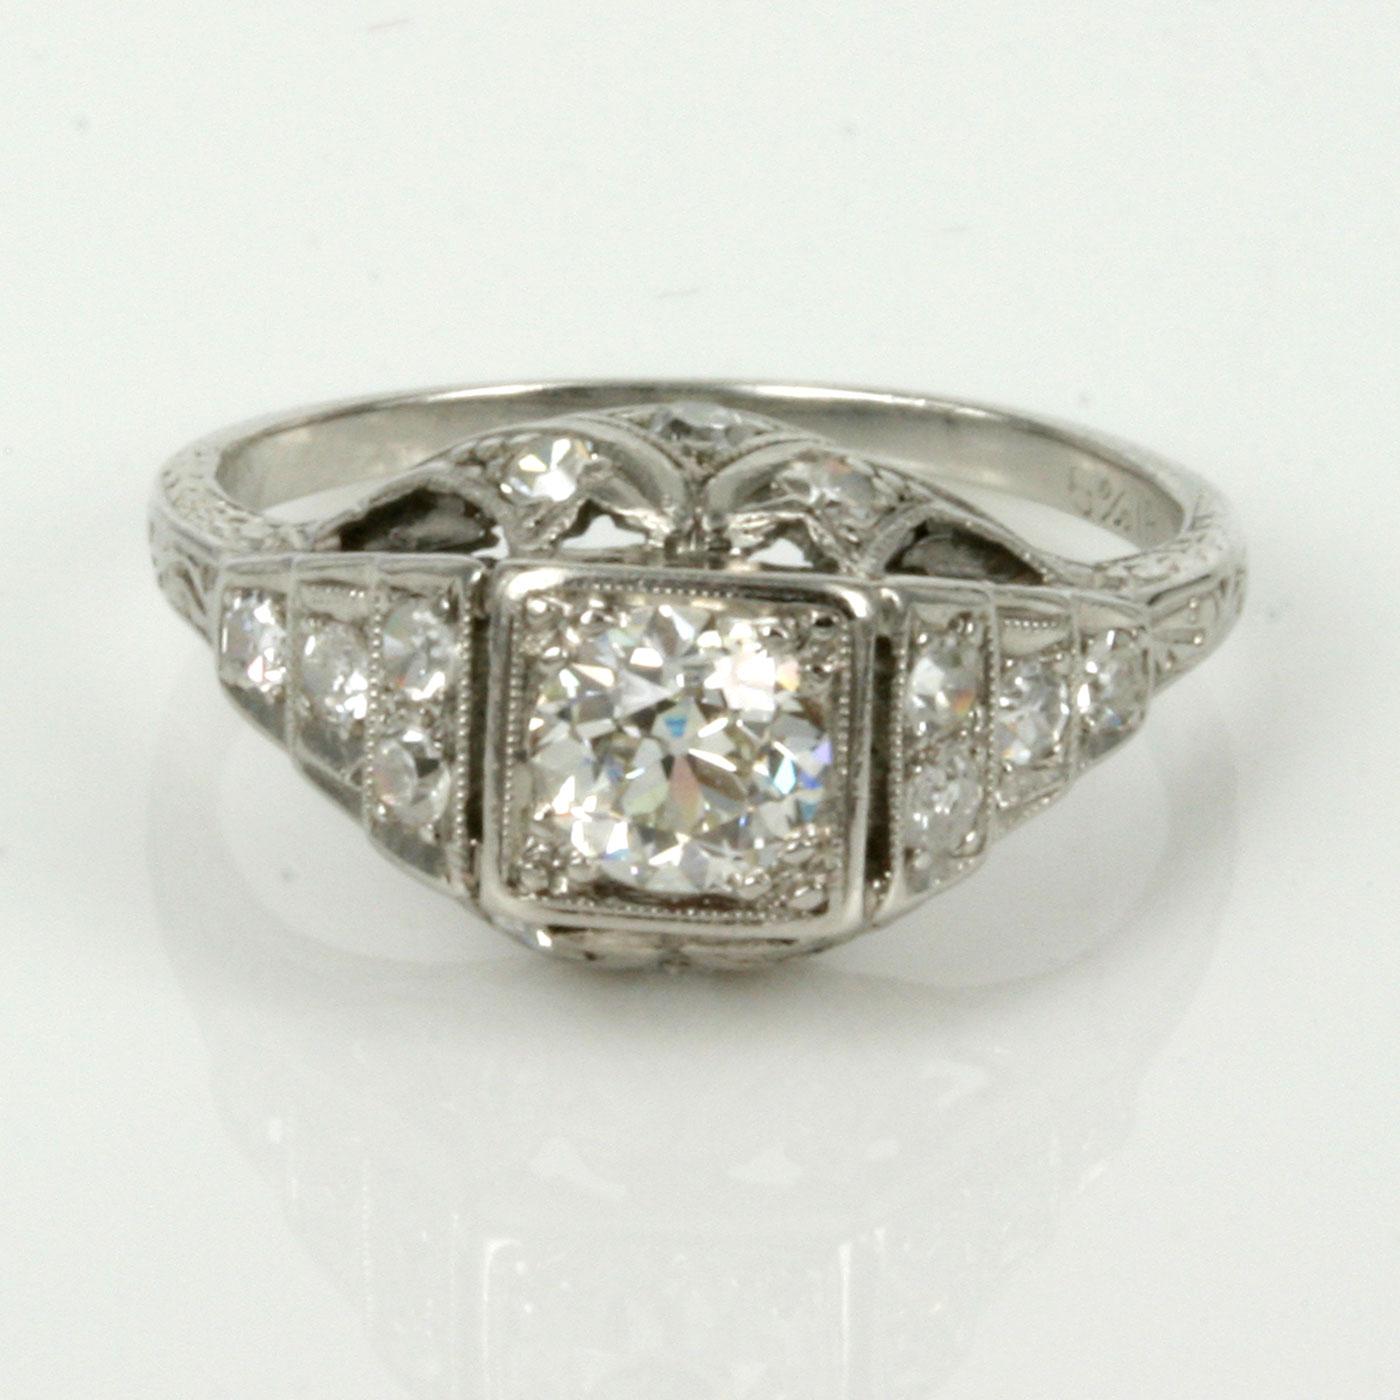 buy 1920 era art deco diamond engagement ring. sold items, sold